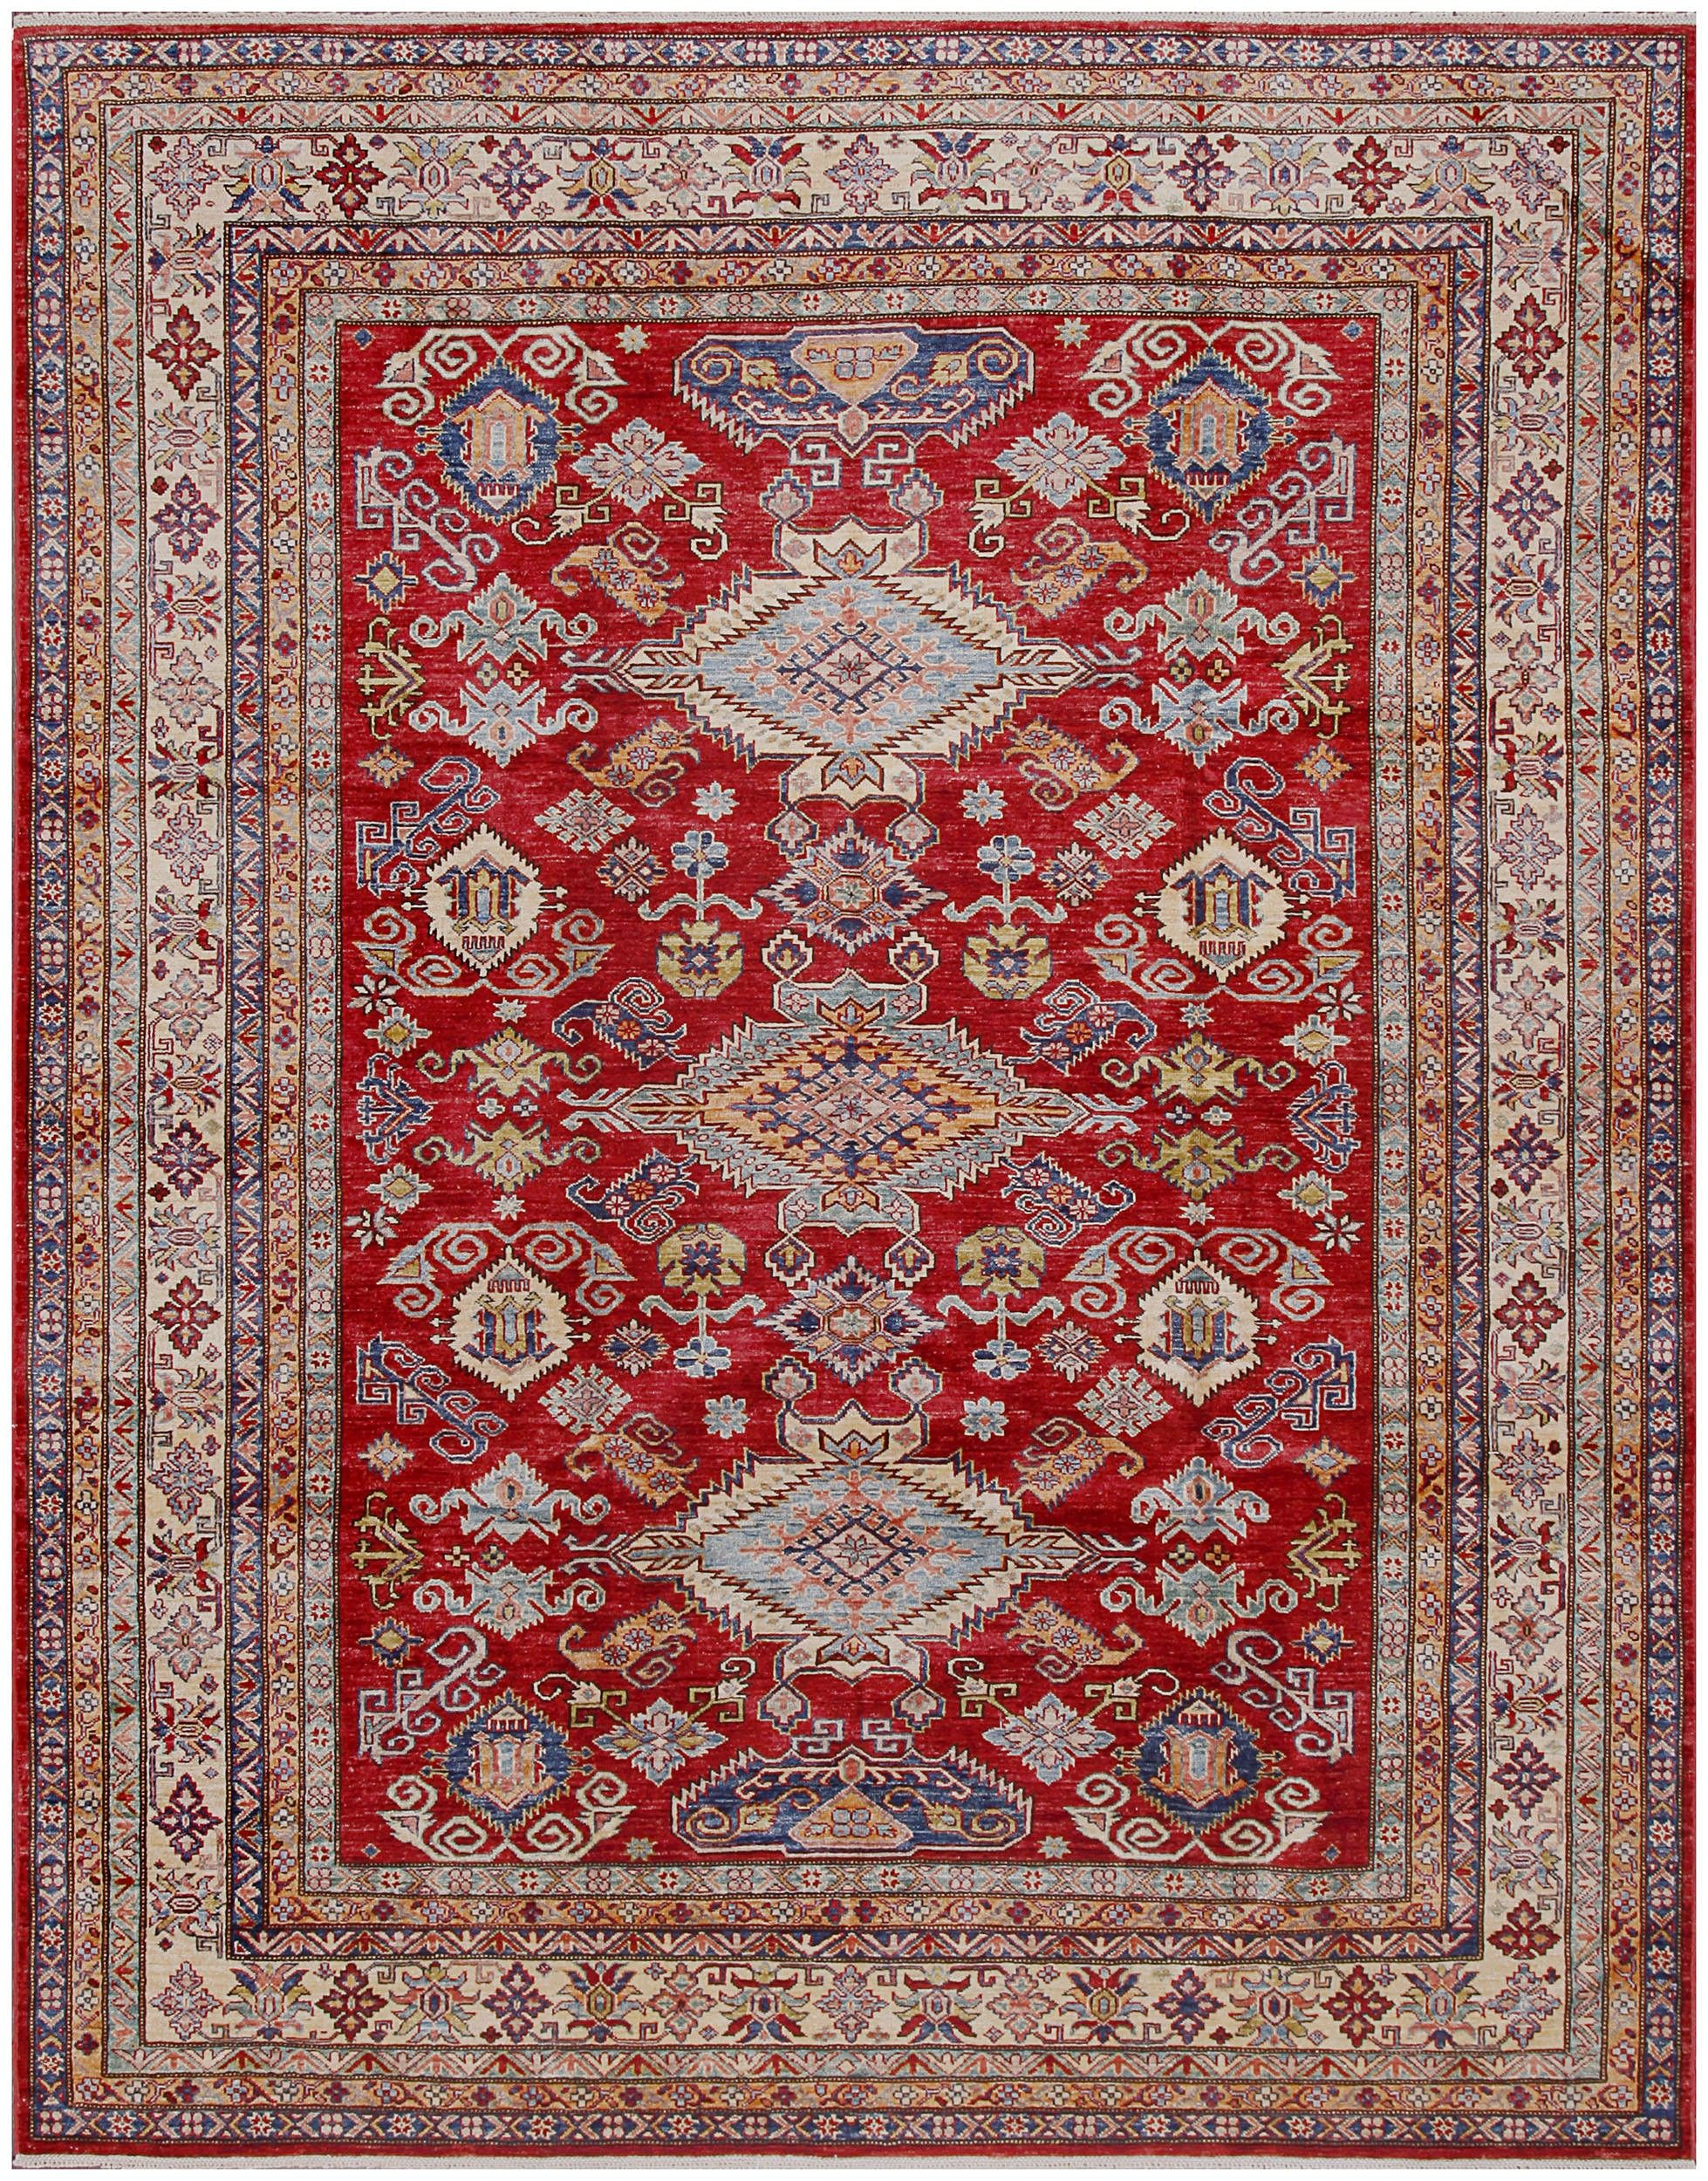 Rugsville Fine Tribal Kazak Red Wool Rug 8 X 10 1 Red Wool Rug Buying Carpet Carpets Online